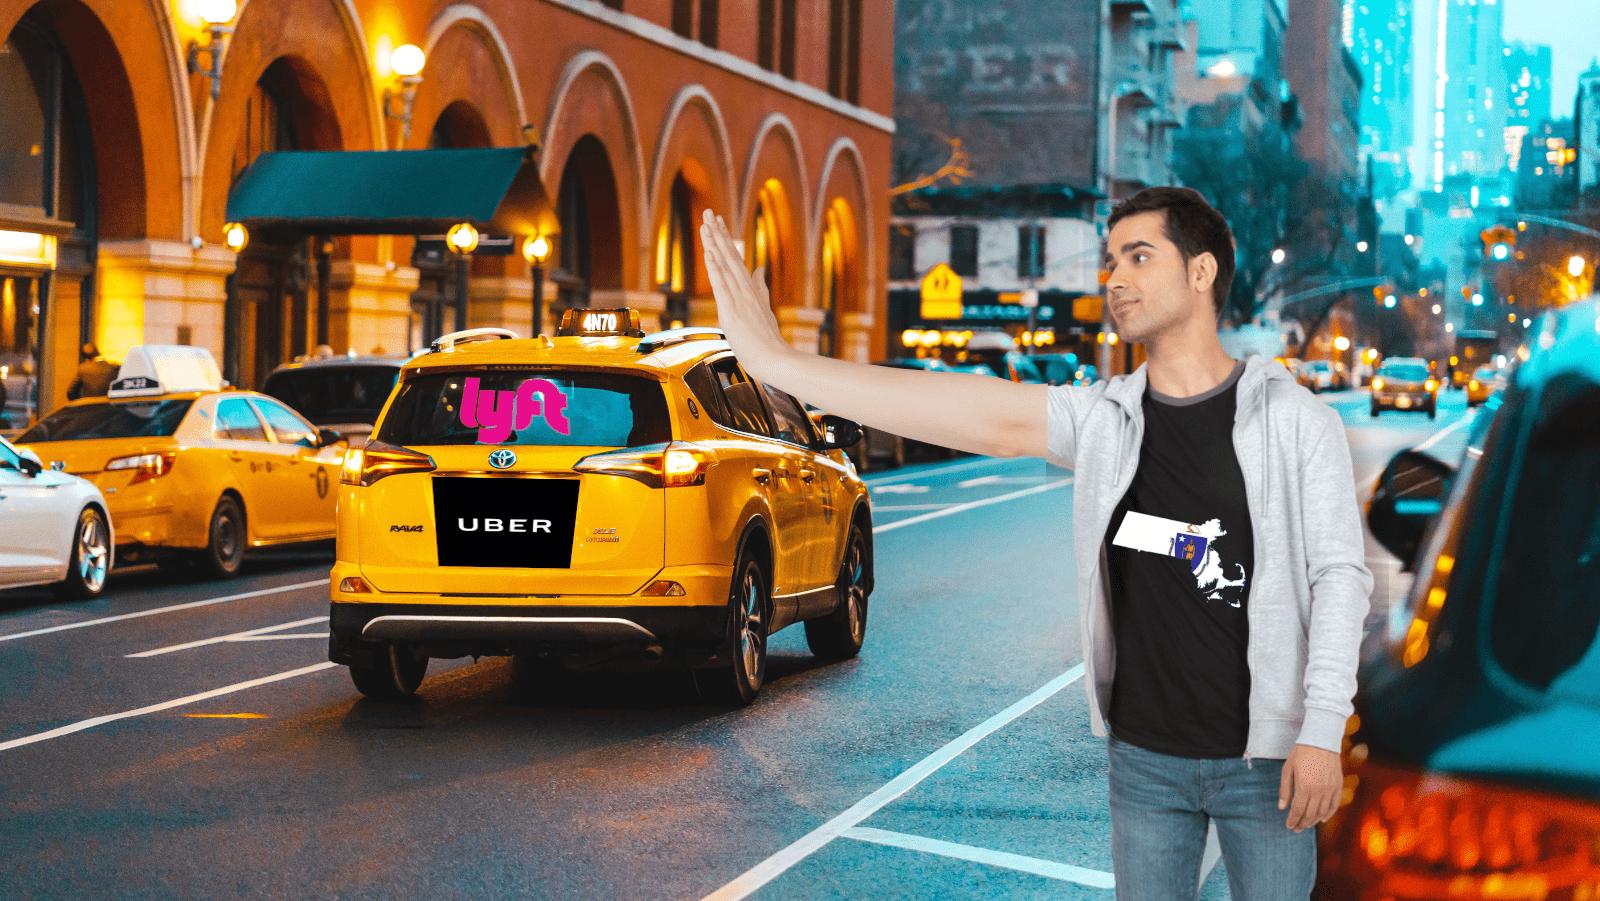 uber, lyft, massachusetts, car, ride, share, hail, future, vehicle, ev, workers, ab5